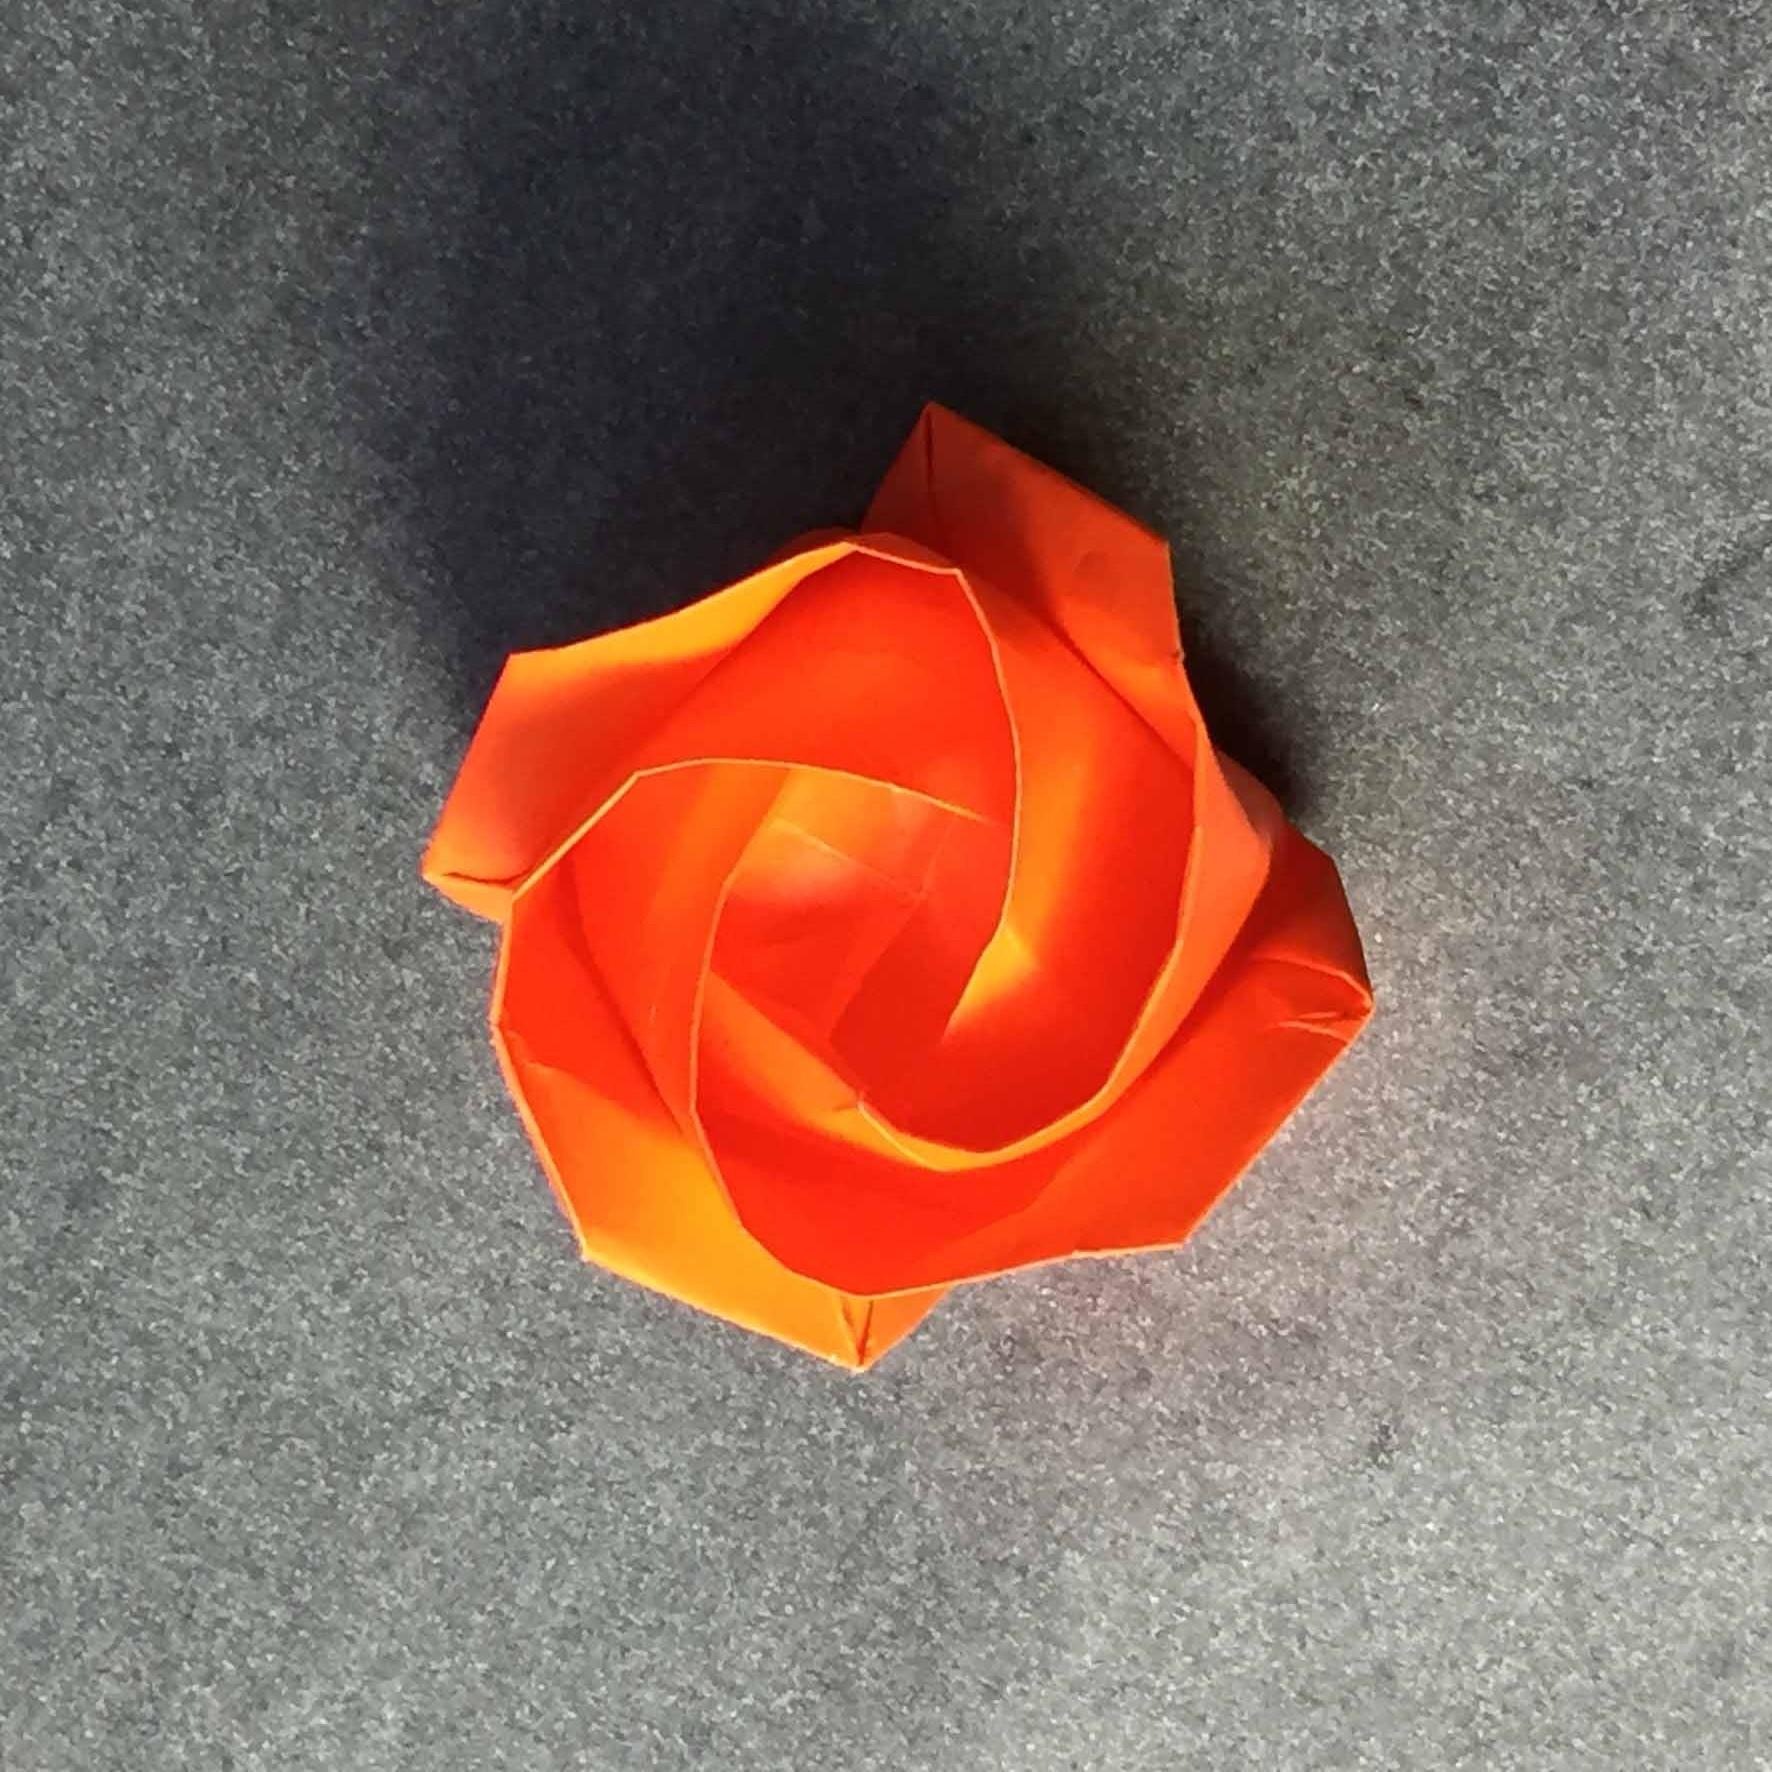 DIY Magic Rose Cube | Paper Craft Ideas | Origami Rose - YouTube | 1772x1772